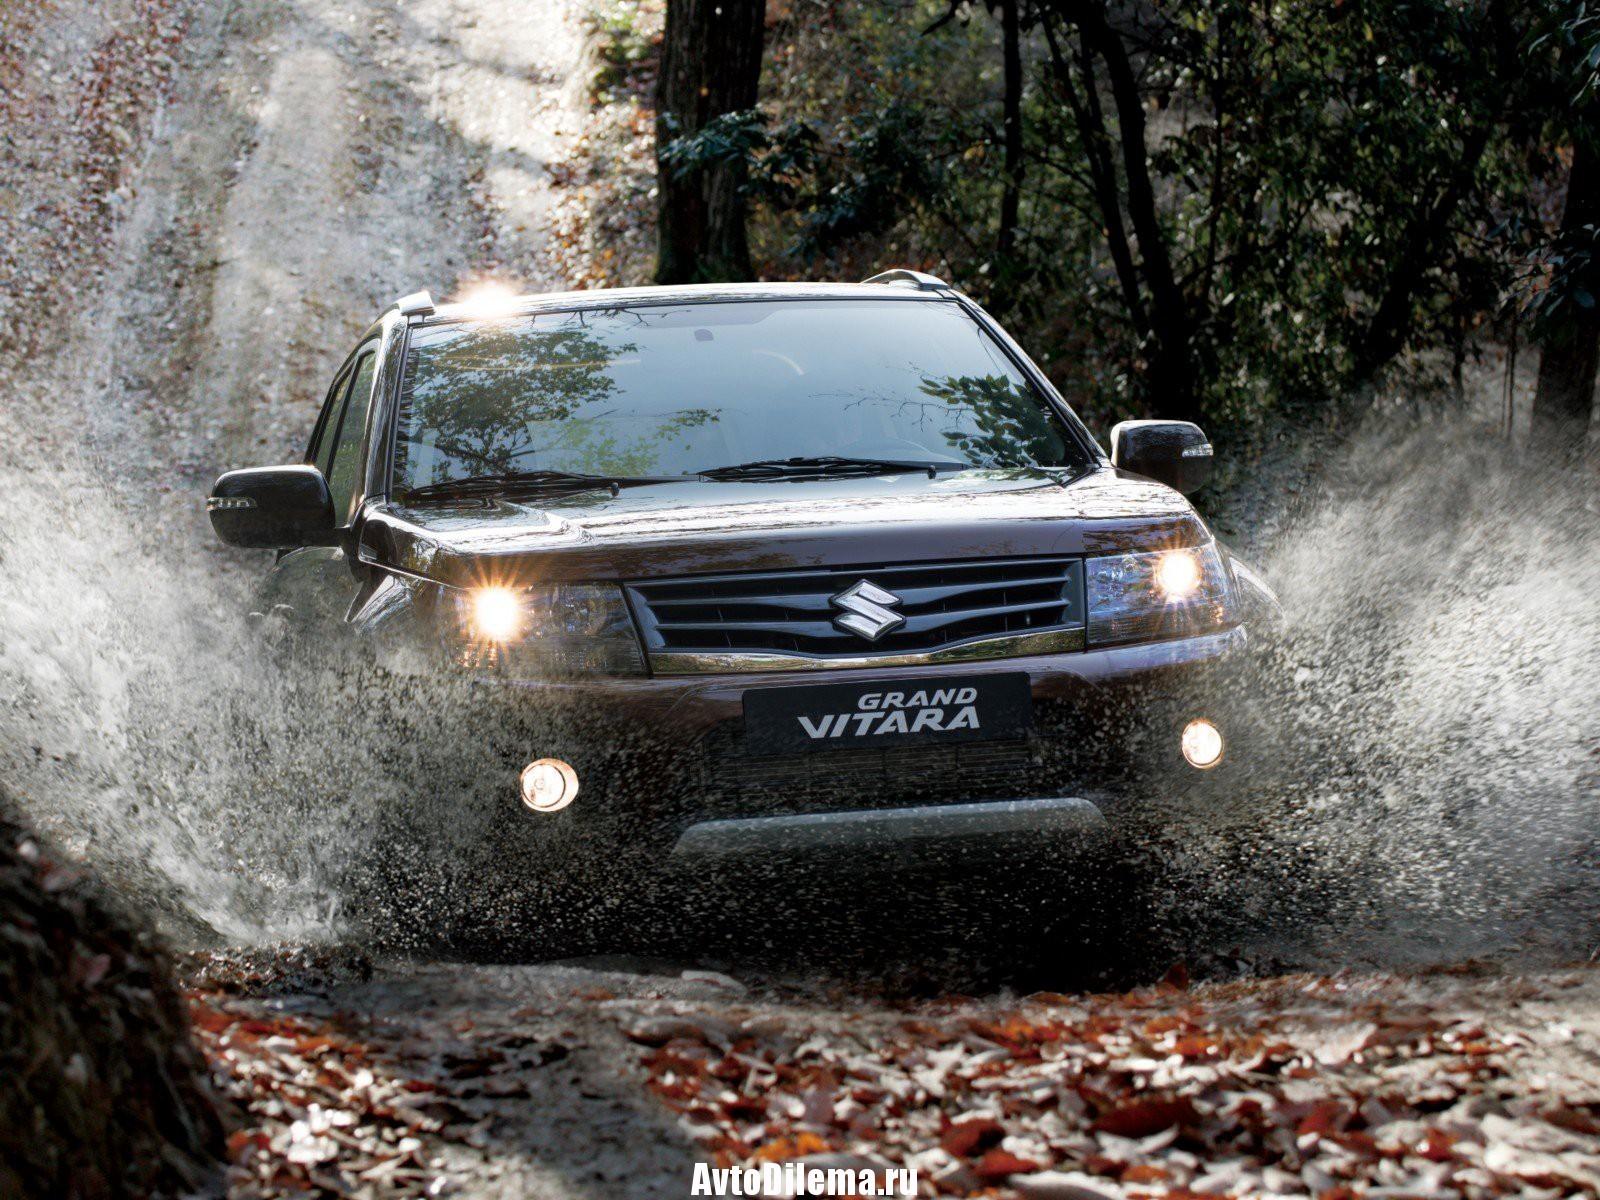 Проблемы «паркетного джипа» — Suzuki Grand Vitara